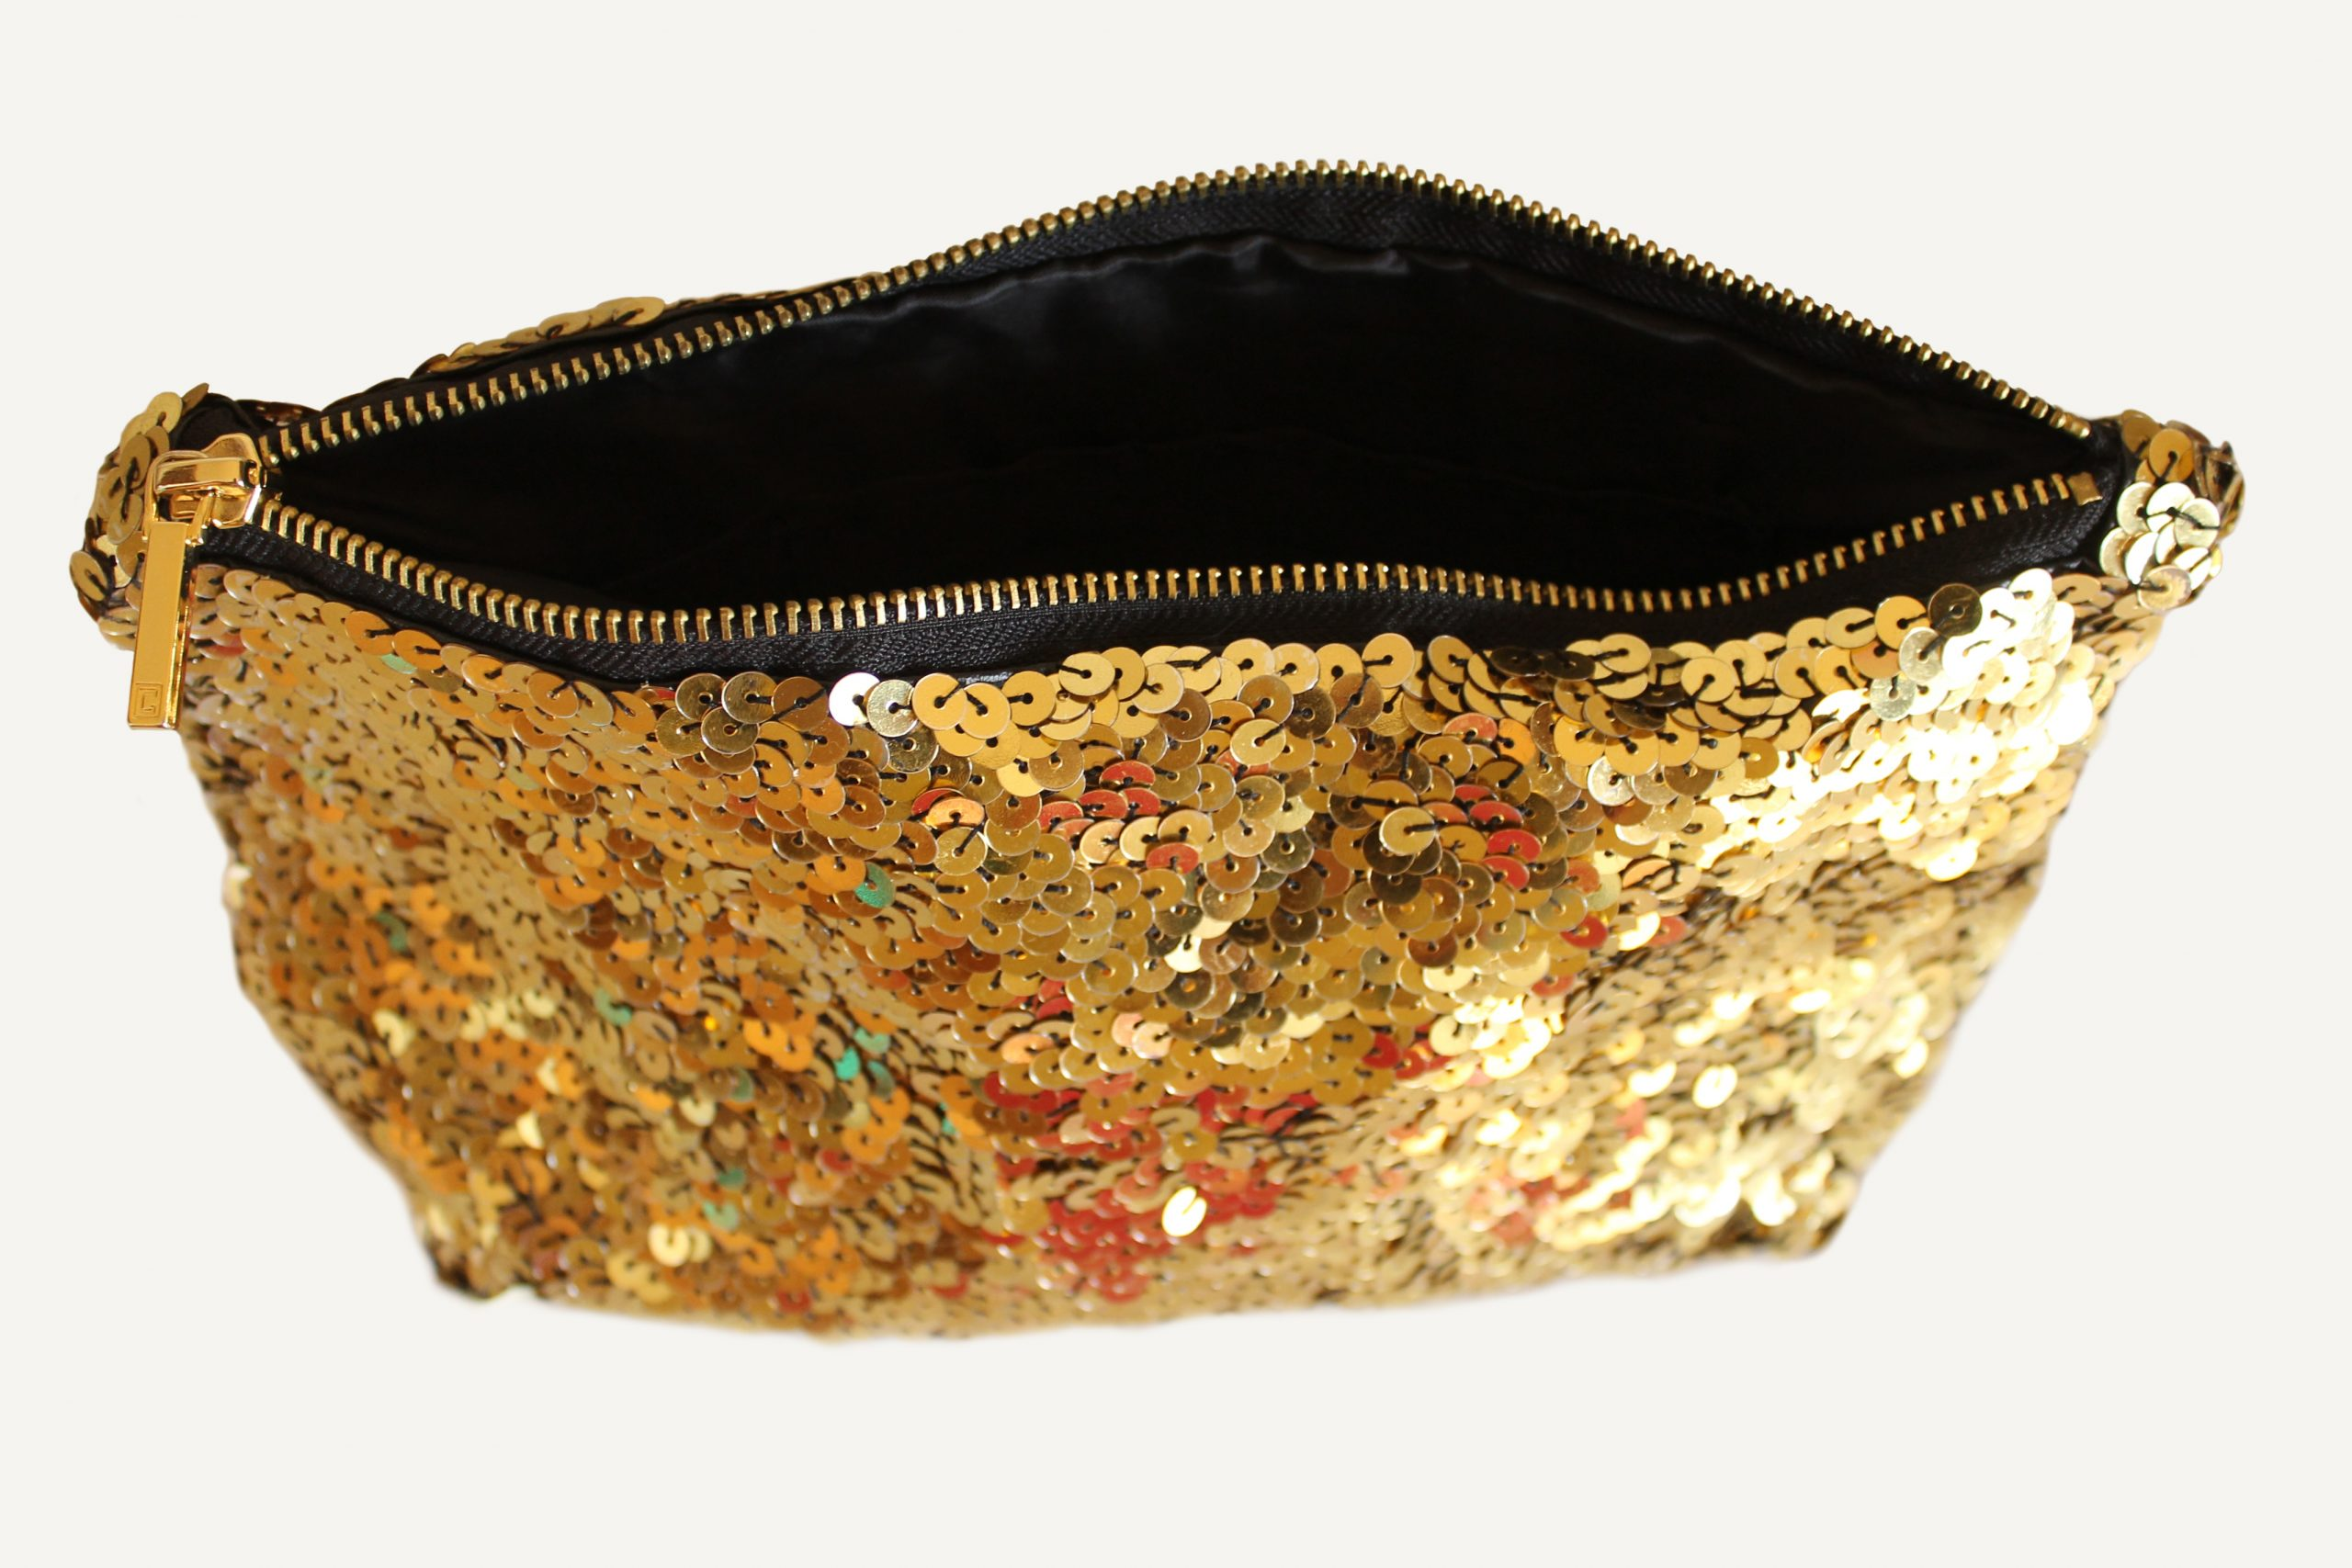 Zara Inspired Gold Sequined Clutch